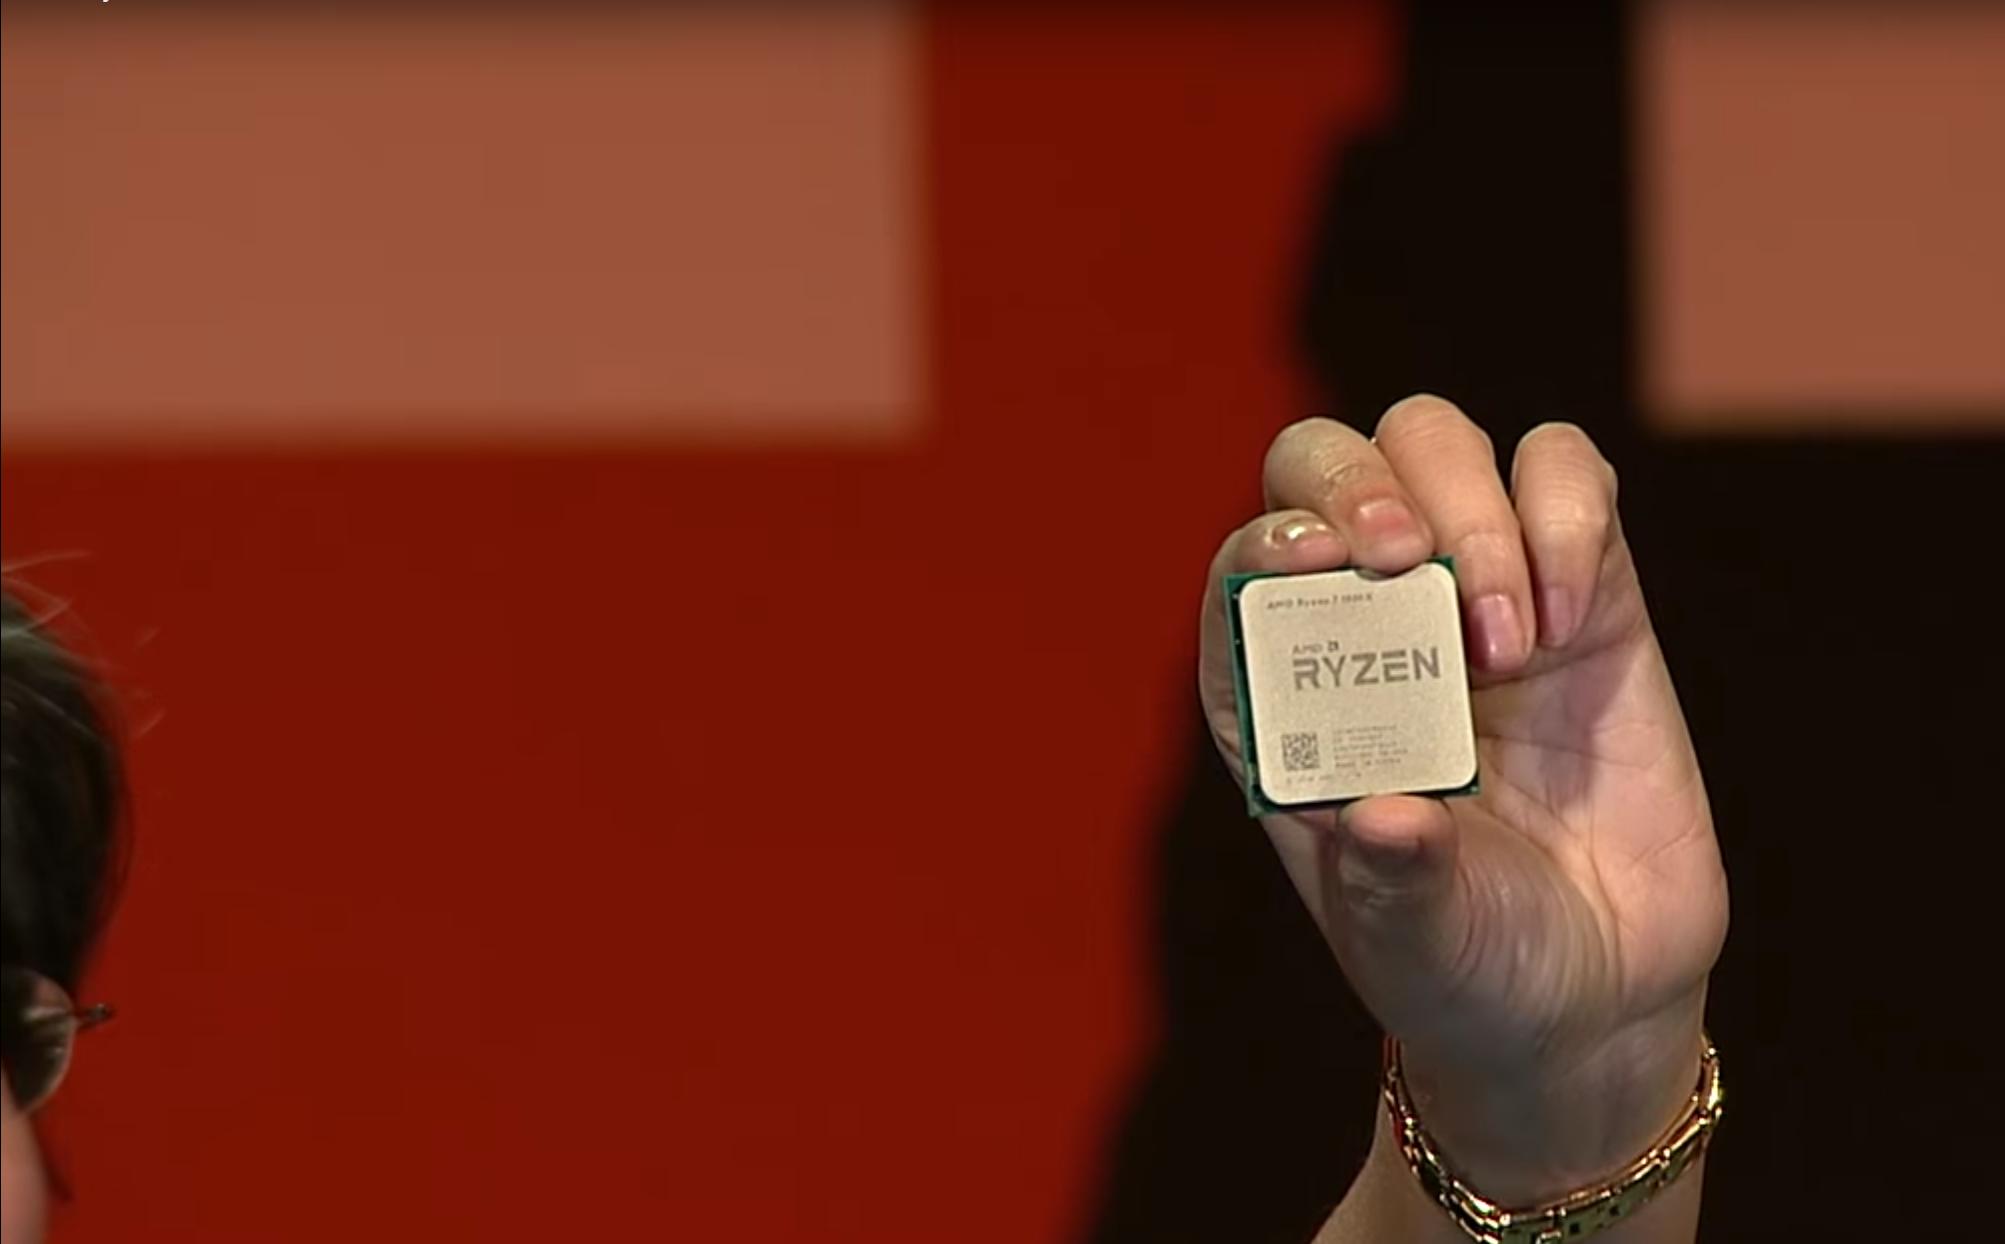 ryzen processador